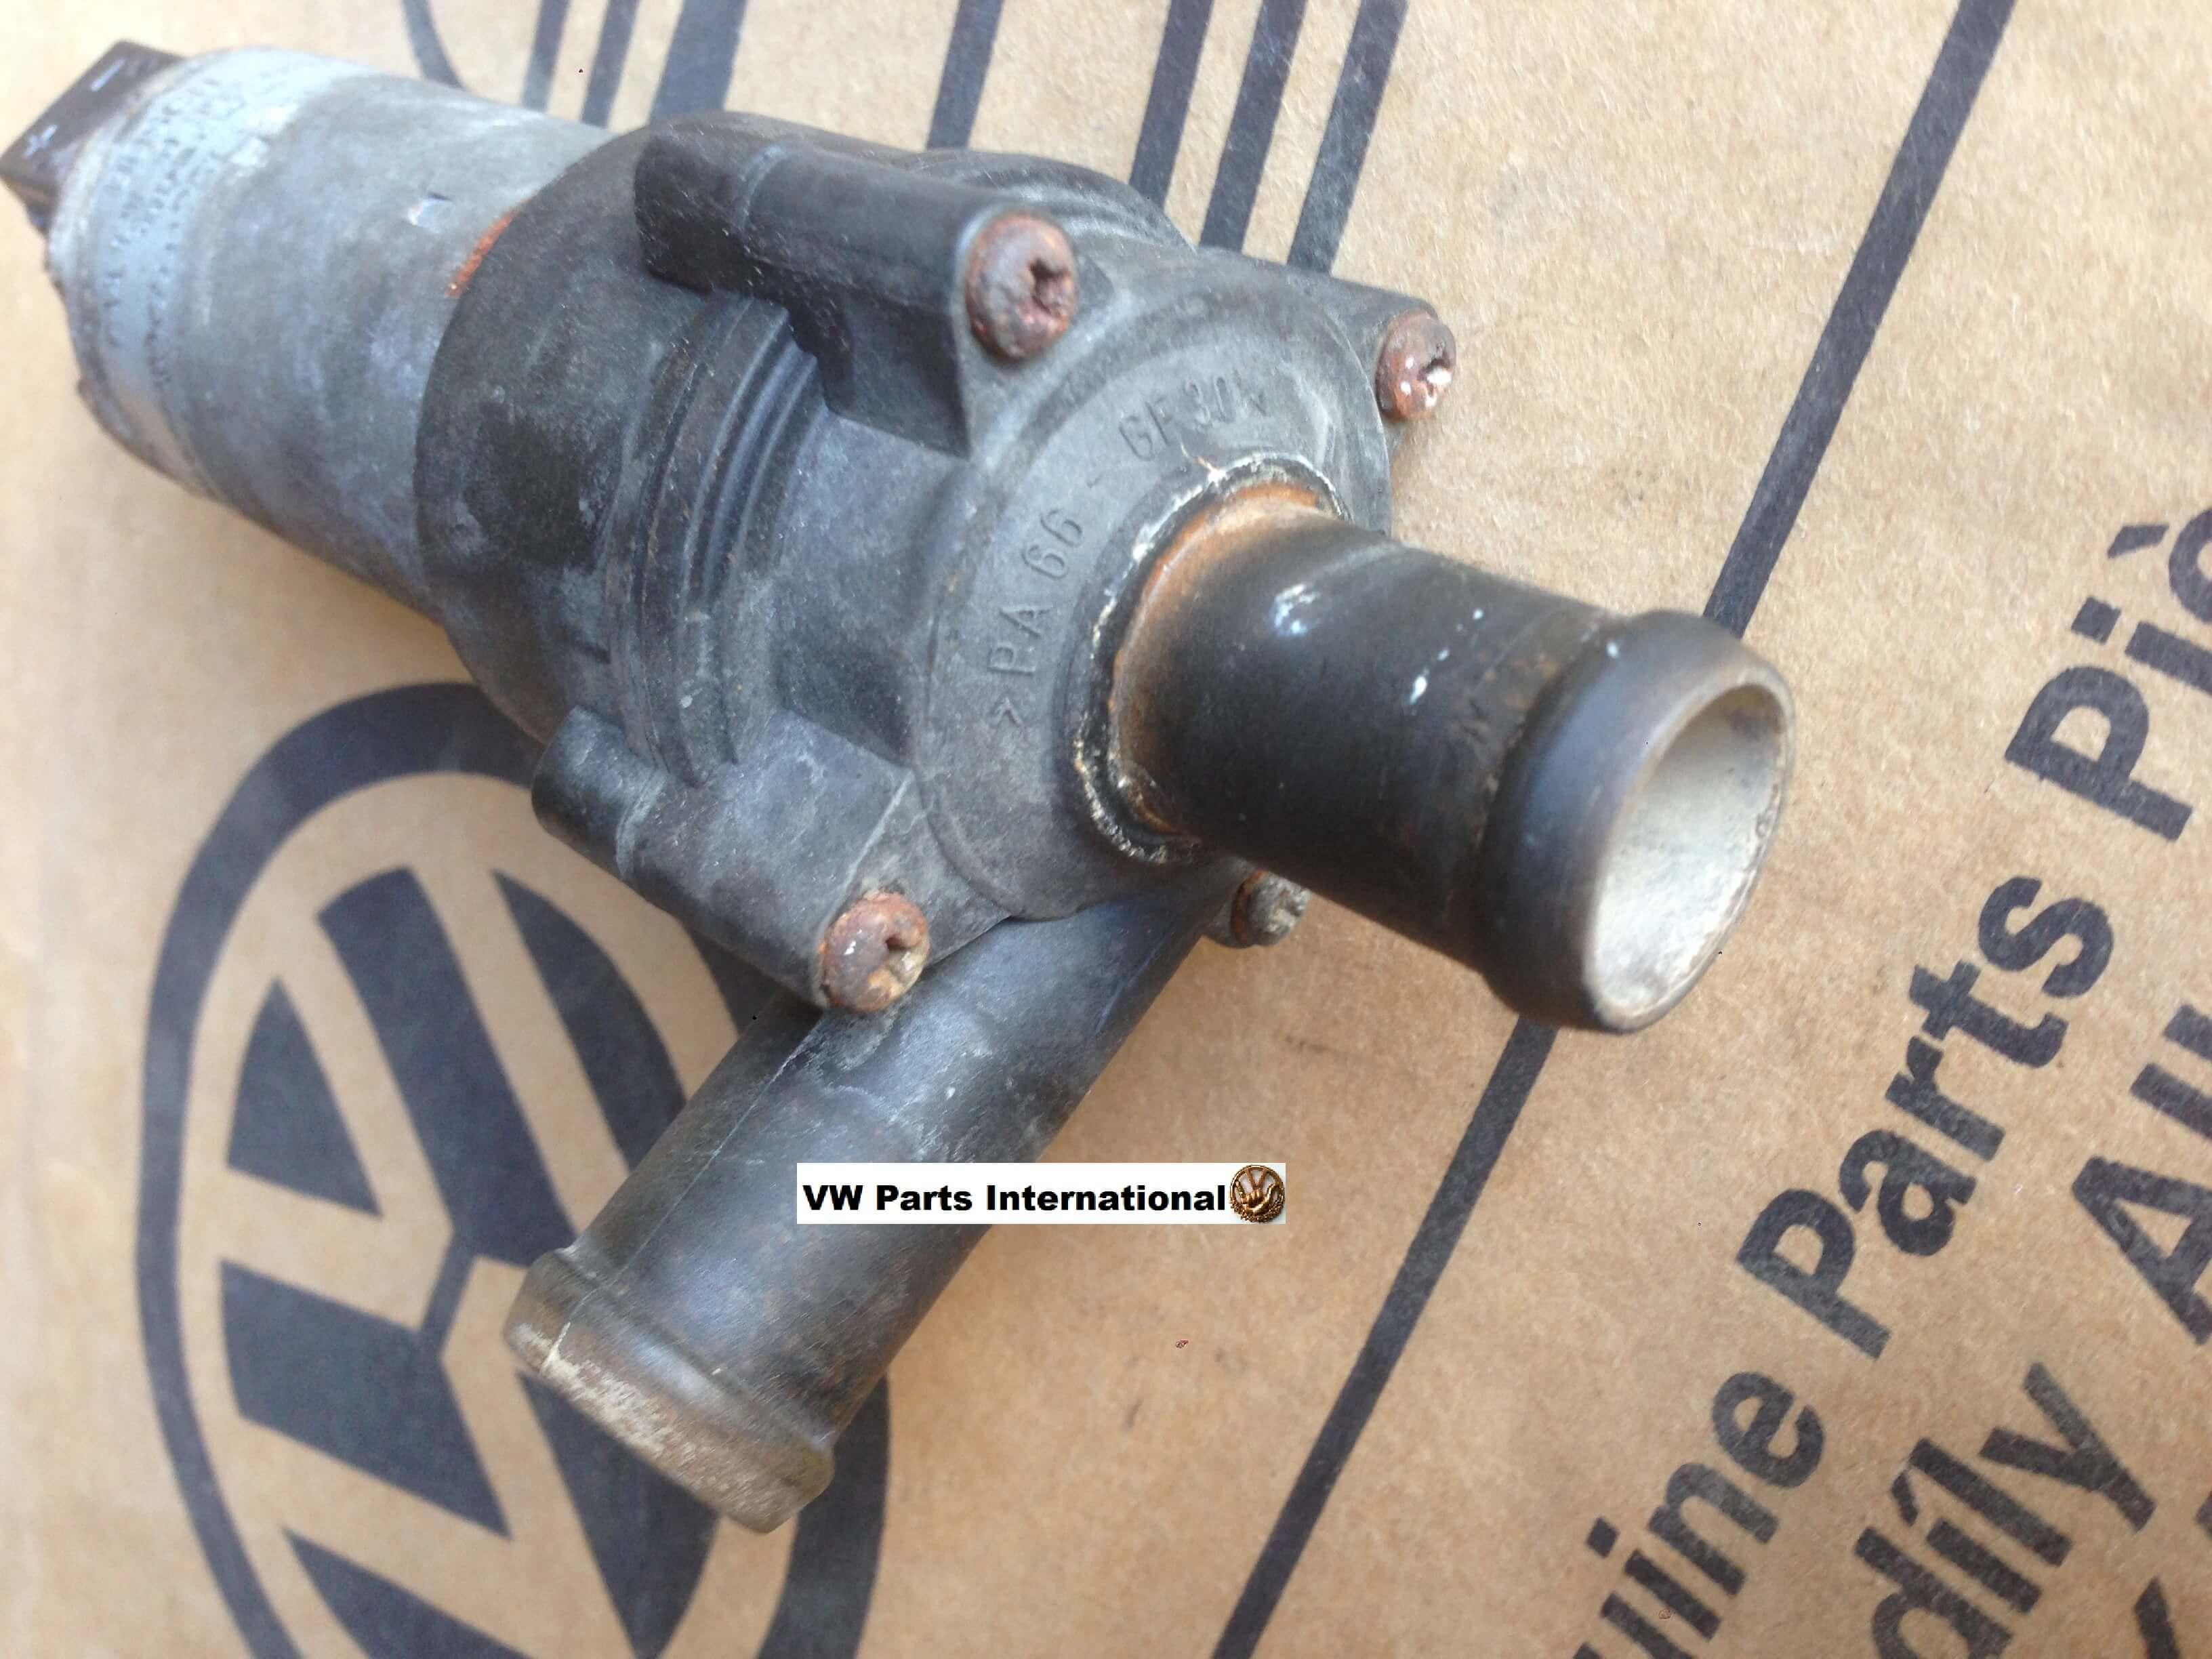 vw Golf Engine Coolant vw Golf Mk3 2.8 Vr6 Engine